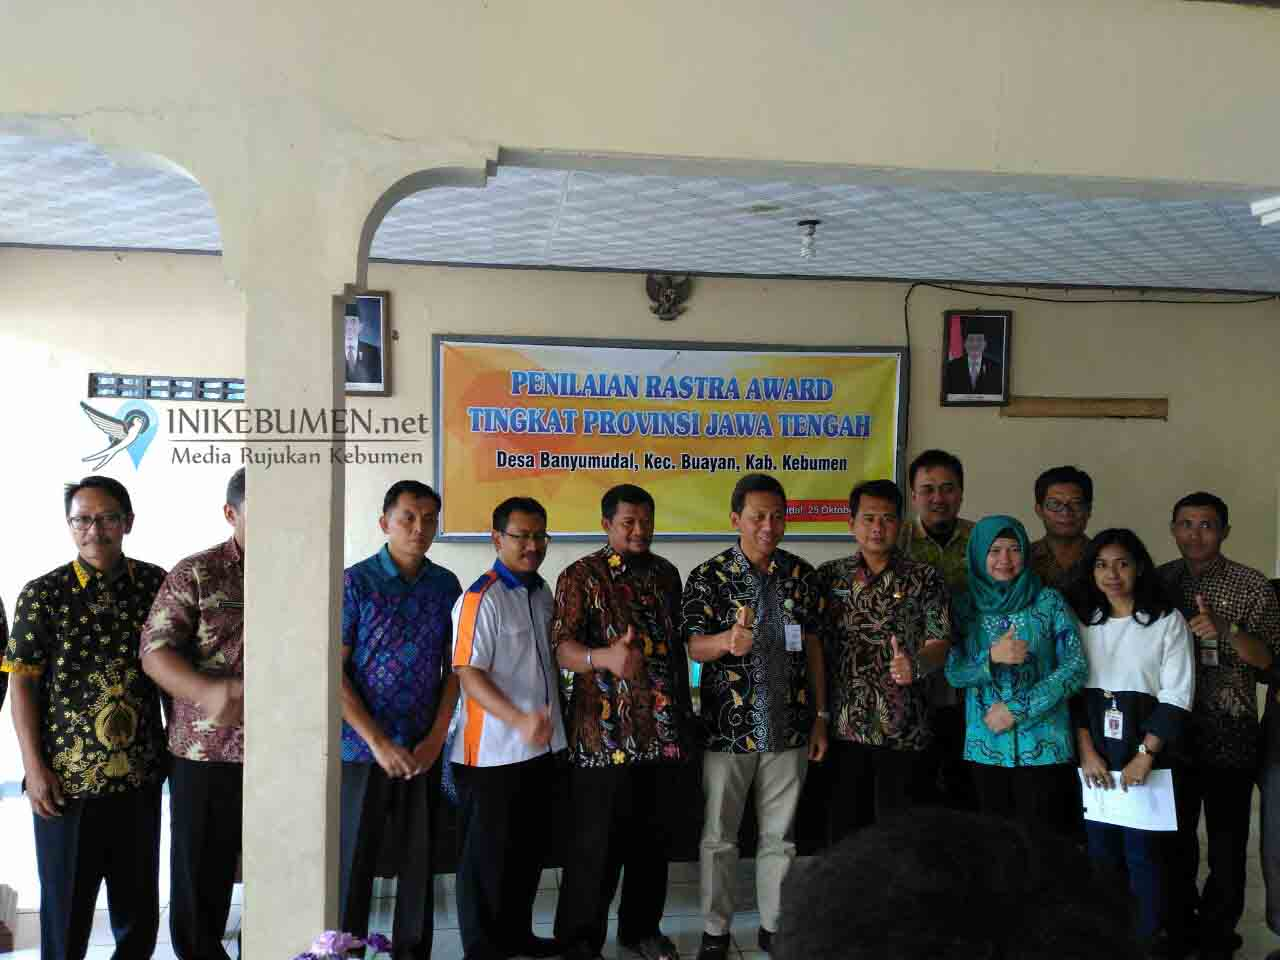 Maju Lomba Rastra Award Tingkat Jateng, Desa Banyumudal Ditarget Juara Satu